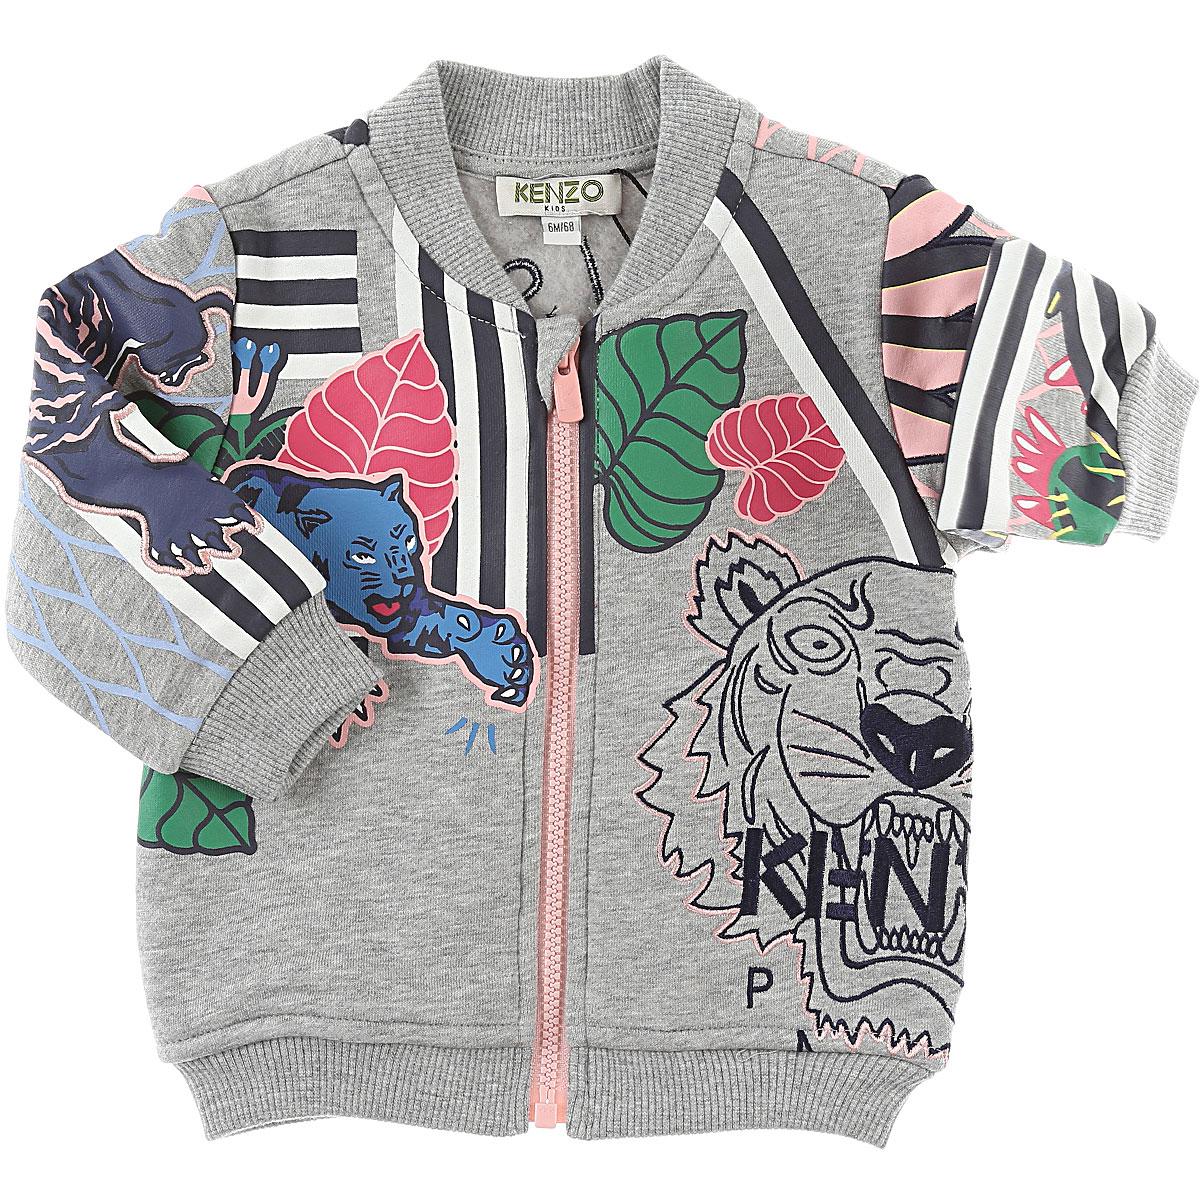 Image of Kenzo Baby Sweatshirts & Hoodies for Girls, Grey, Cotton, 2017, 12M 18M 2Y 6M 9M